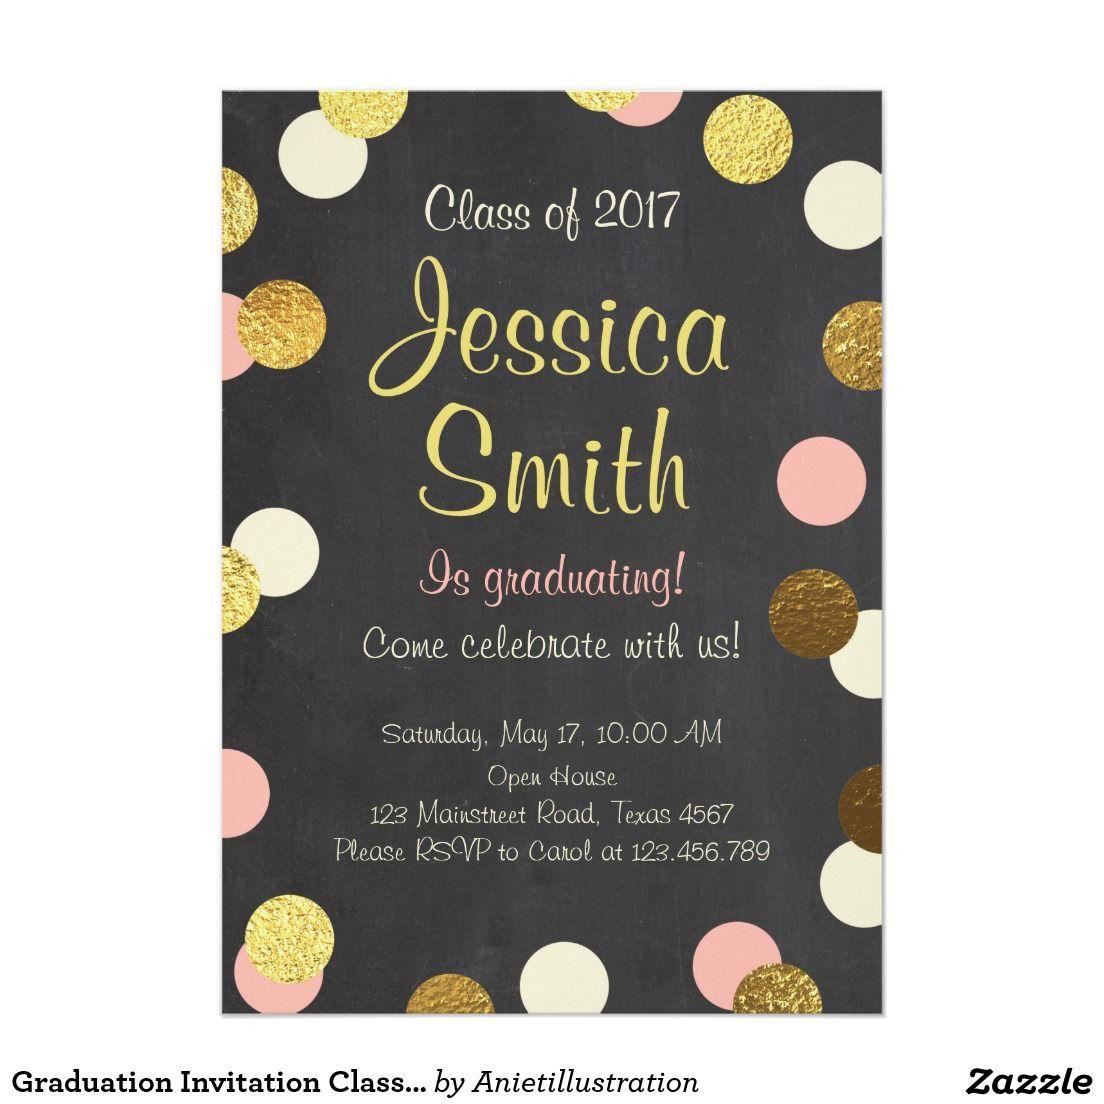 Graduation invitation class 2017 gold black pink school graduation invitation class 2017 gold black pink filmwisefo Images